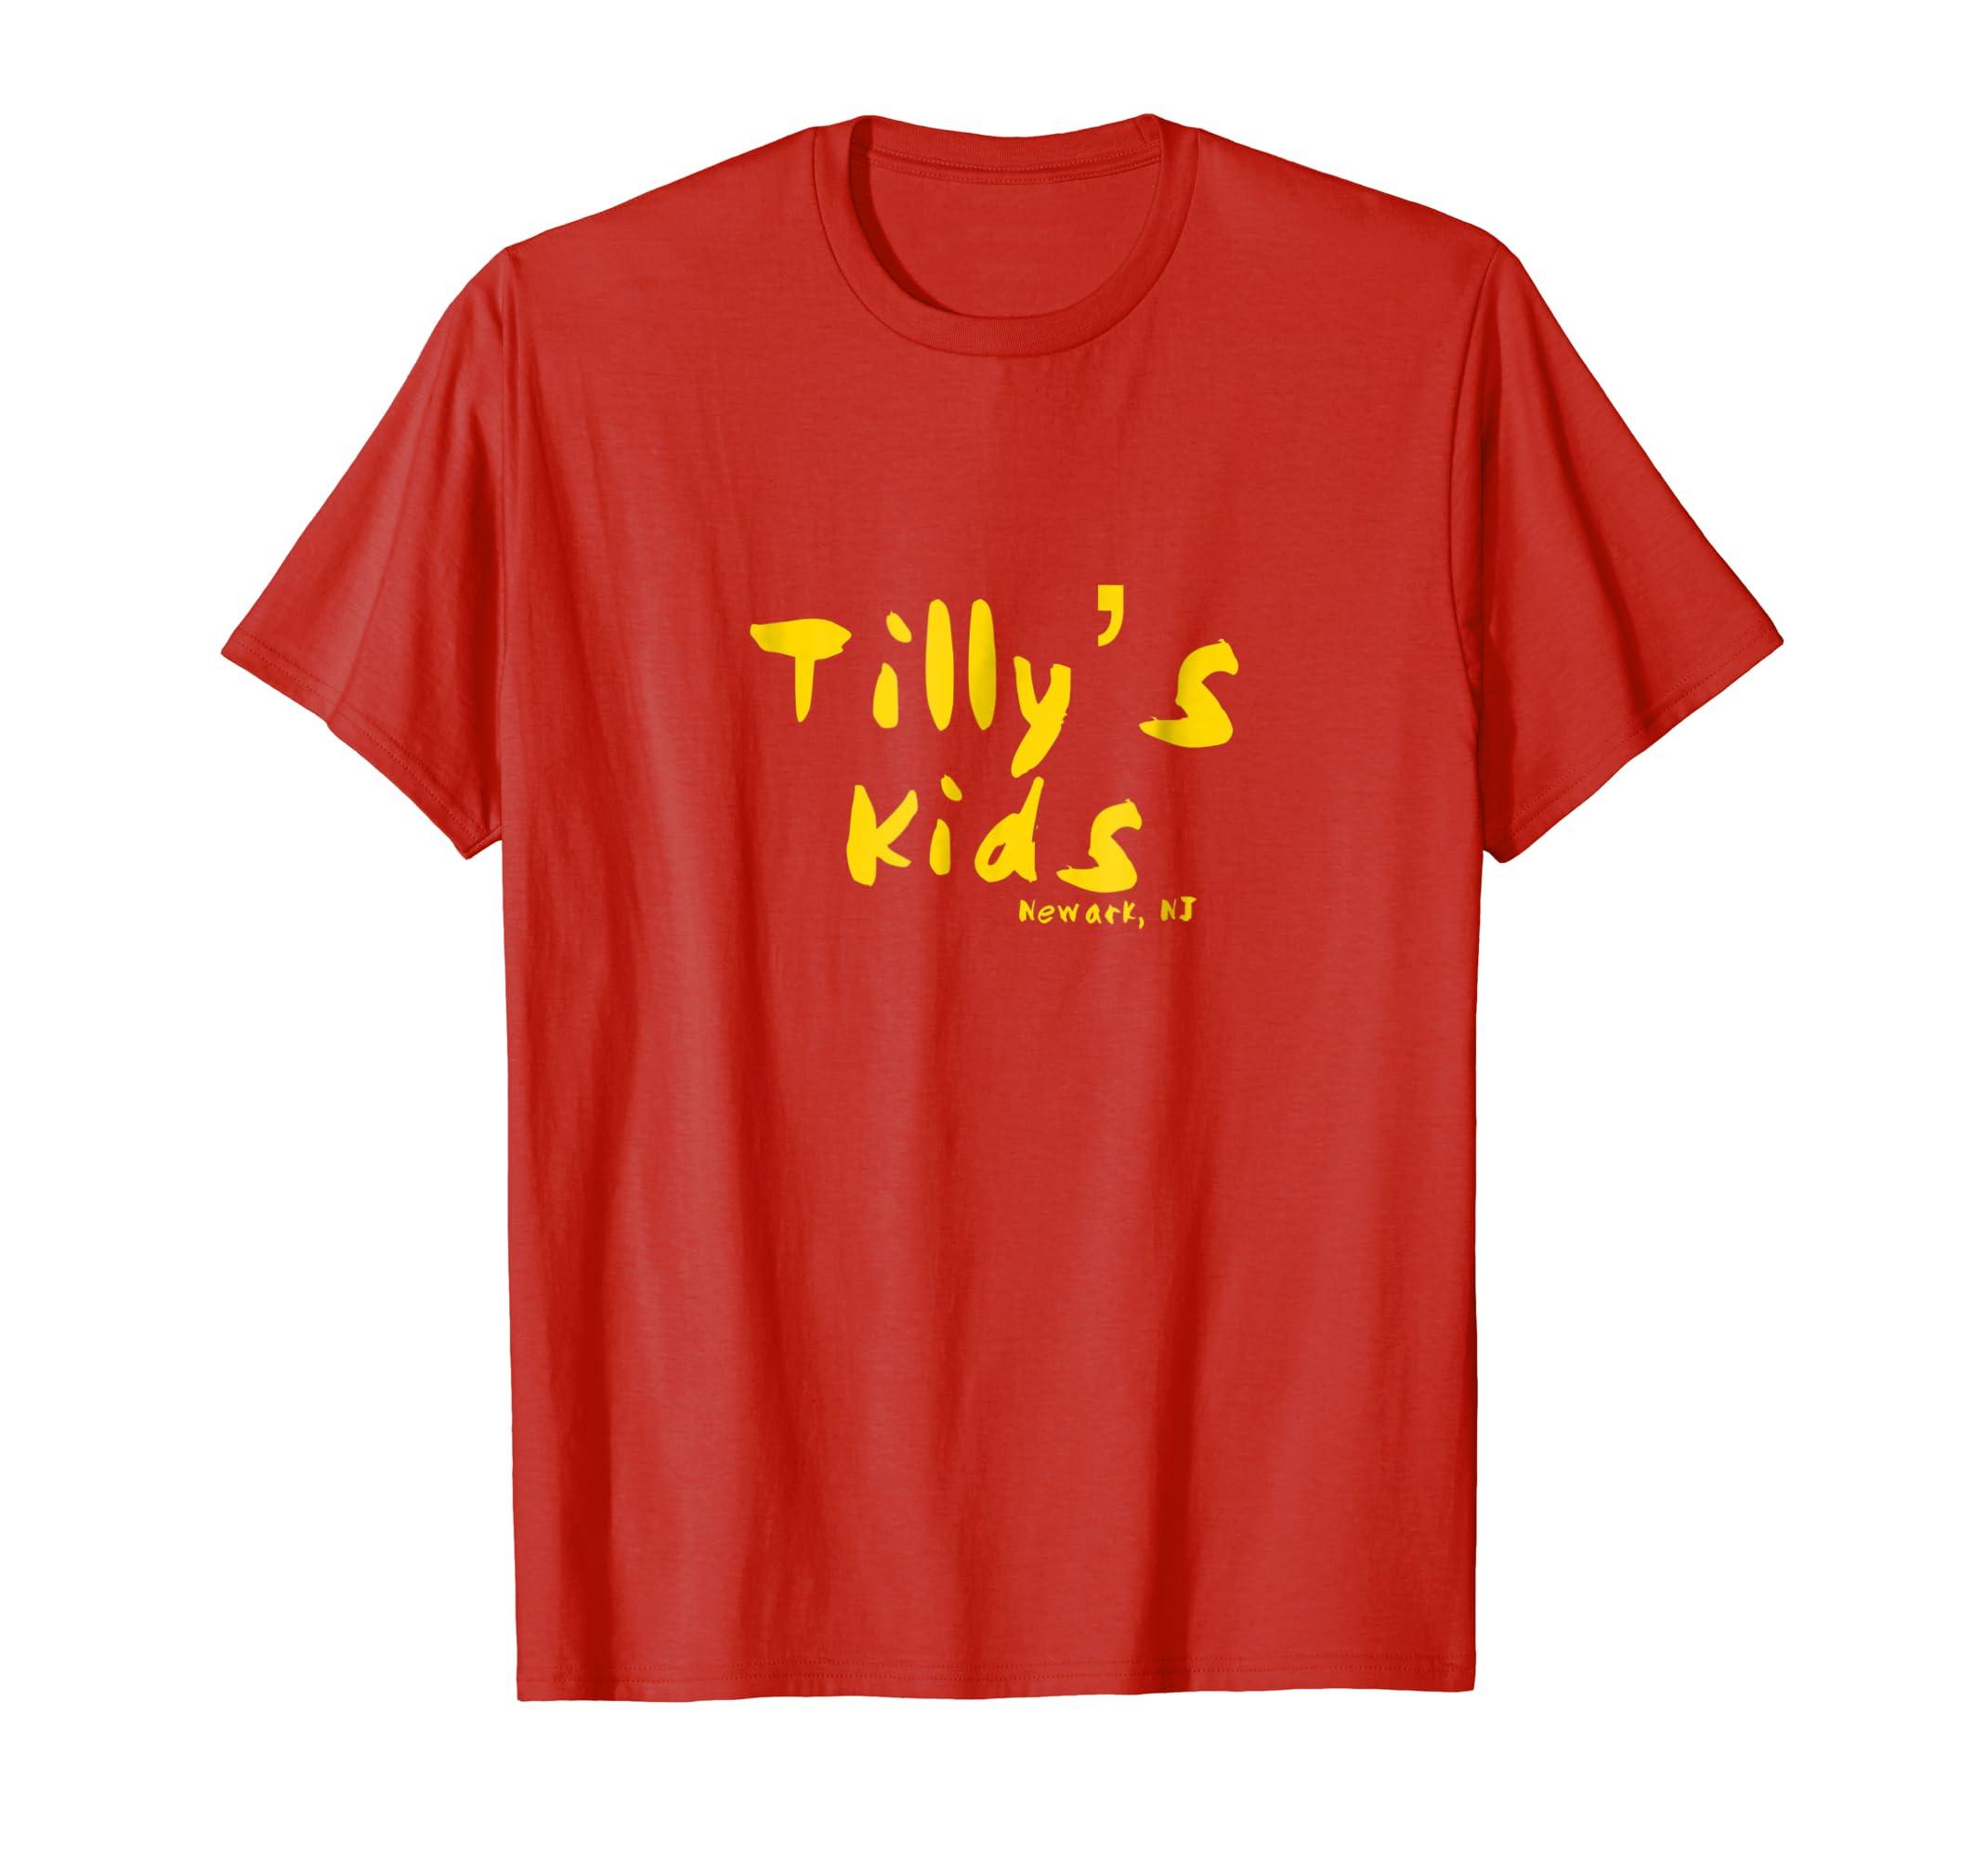 2e4b0e36849 Amazon.com  Tilly s Kids T-Shirt  Clothing